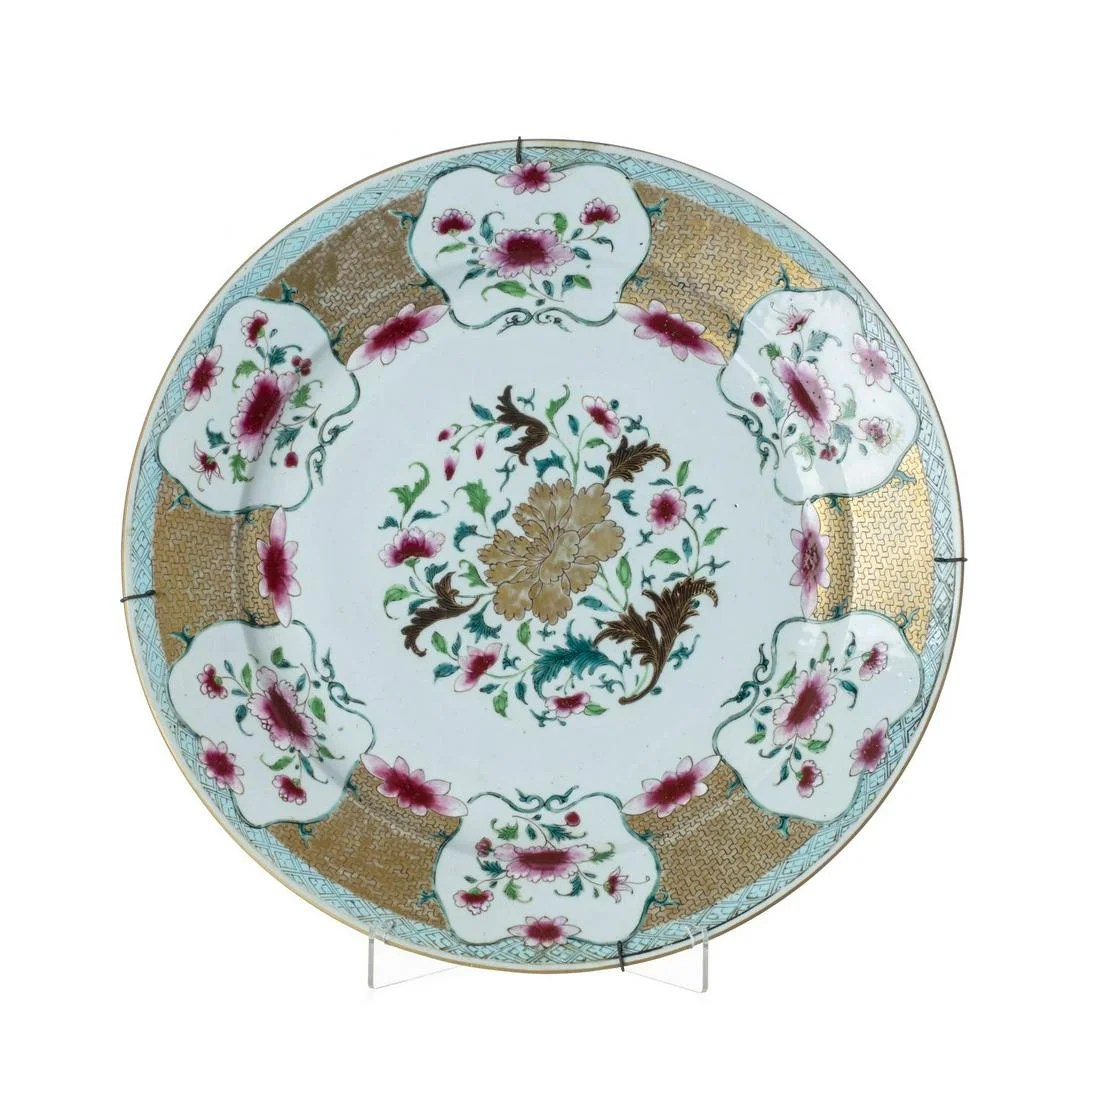 Chinese porcelain plate, Yongzheng